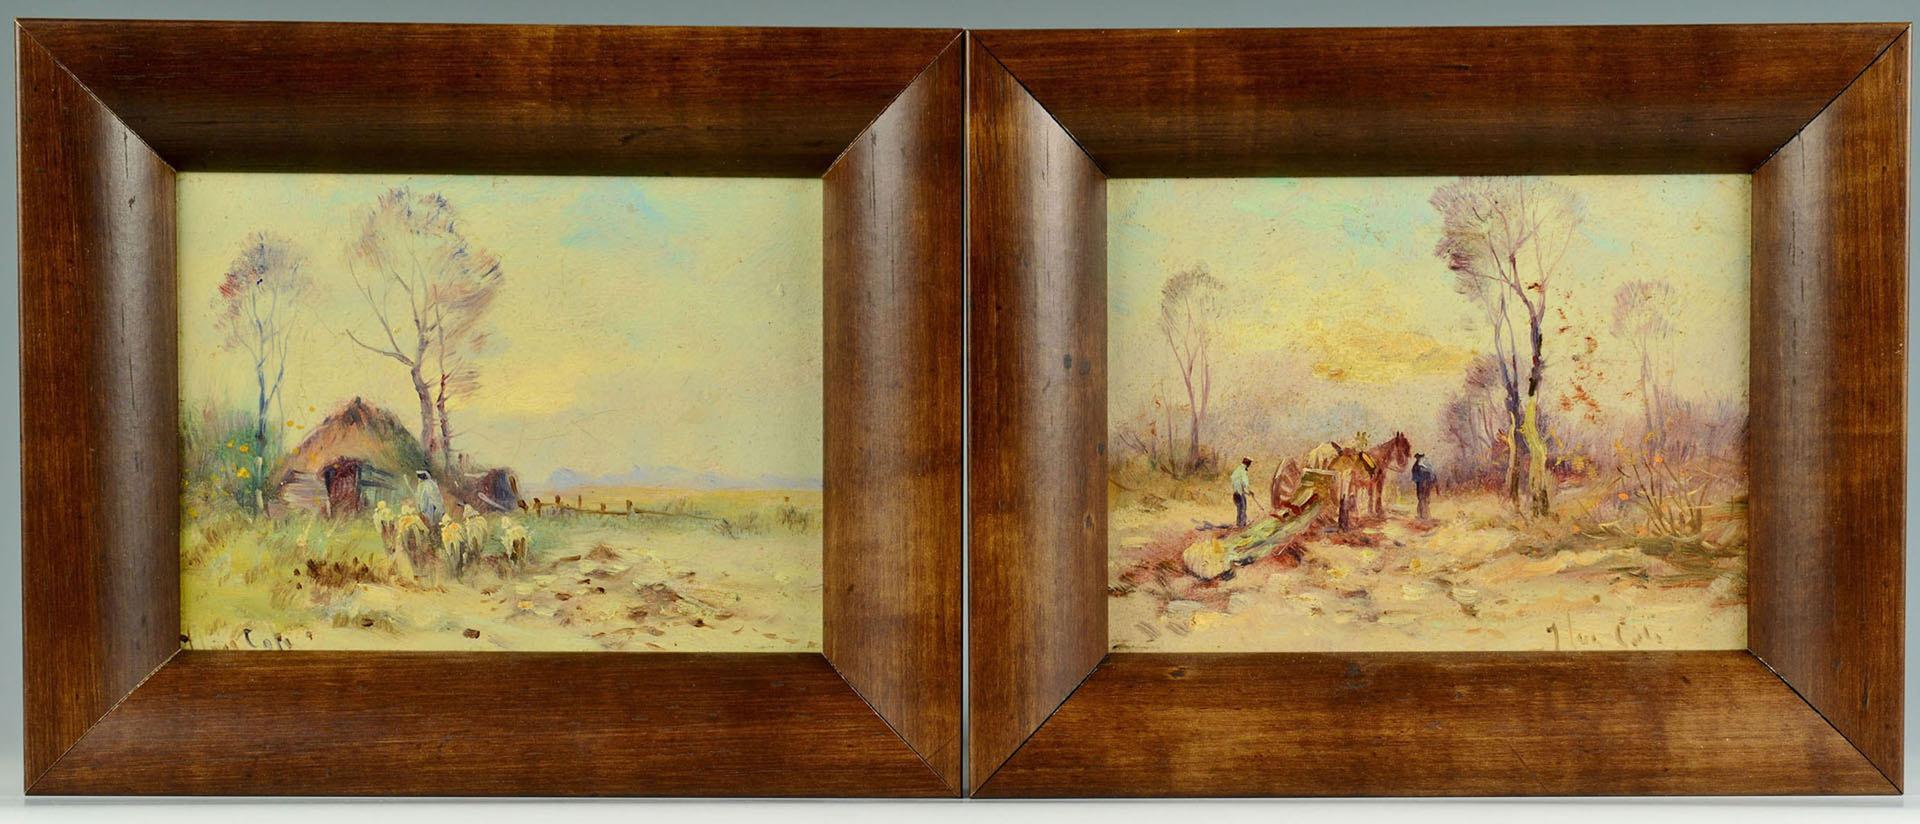 Lot 188: Style of Johannes Ten Cate, Pair Pastoral Scenes